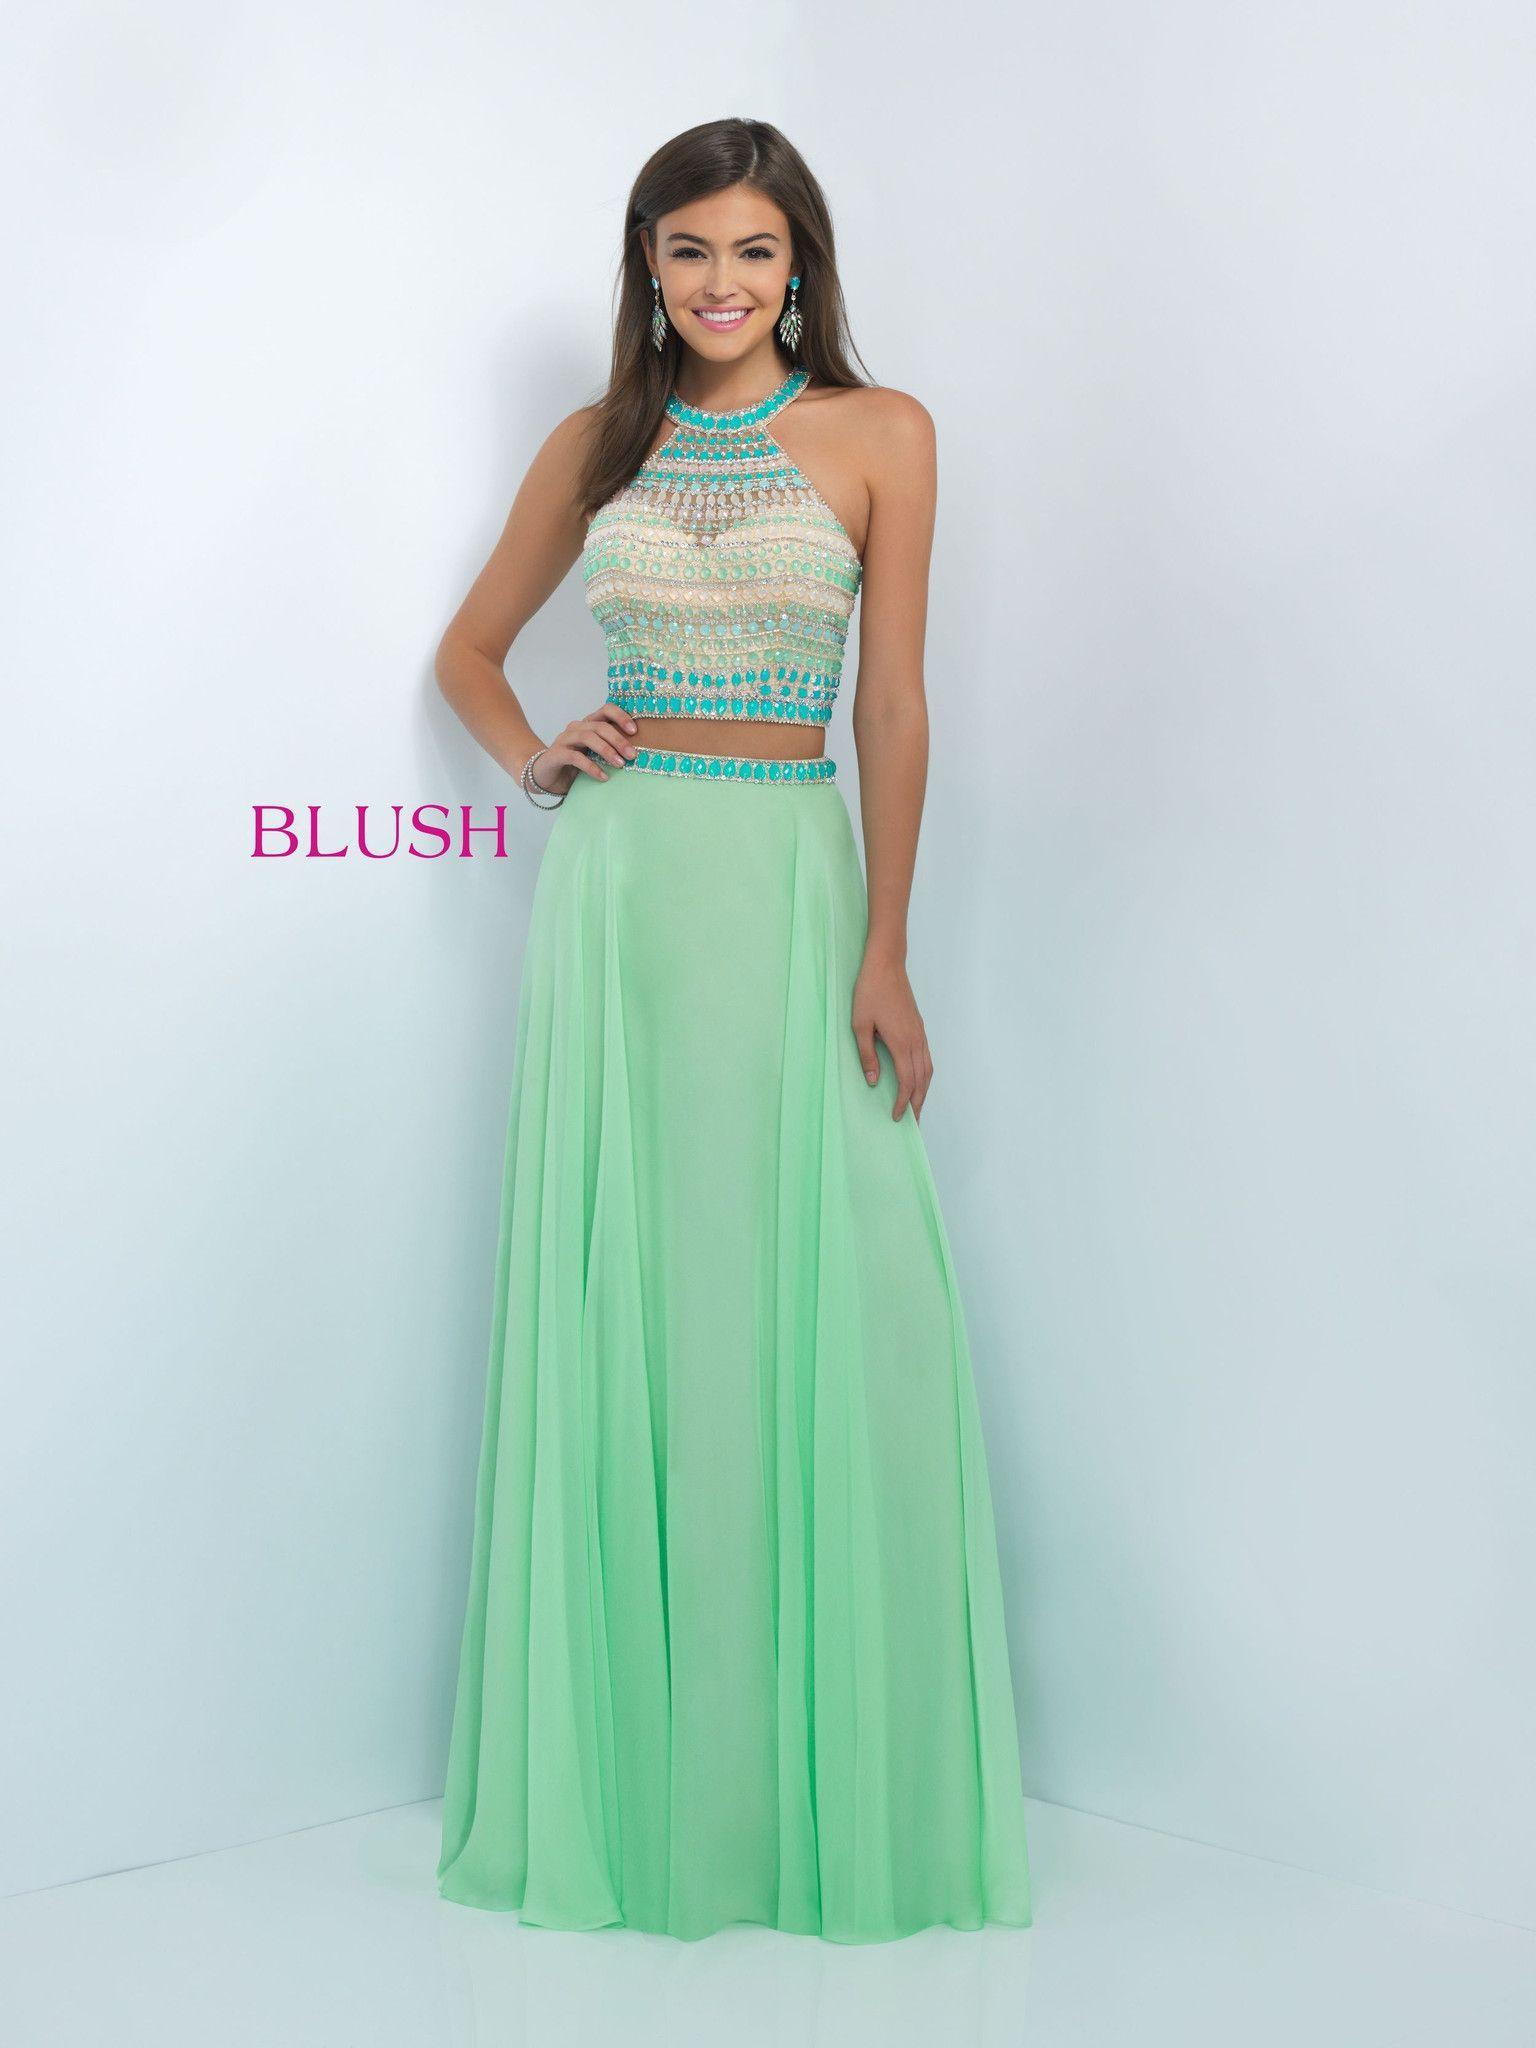 Blush Prom 11056 Honeydew | prom | Pinterest | Blush prom ...